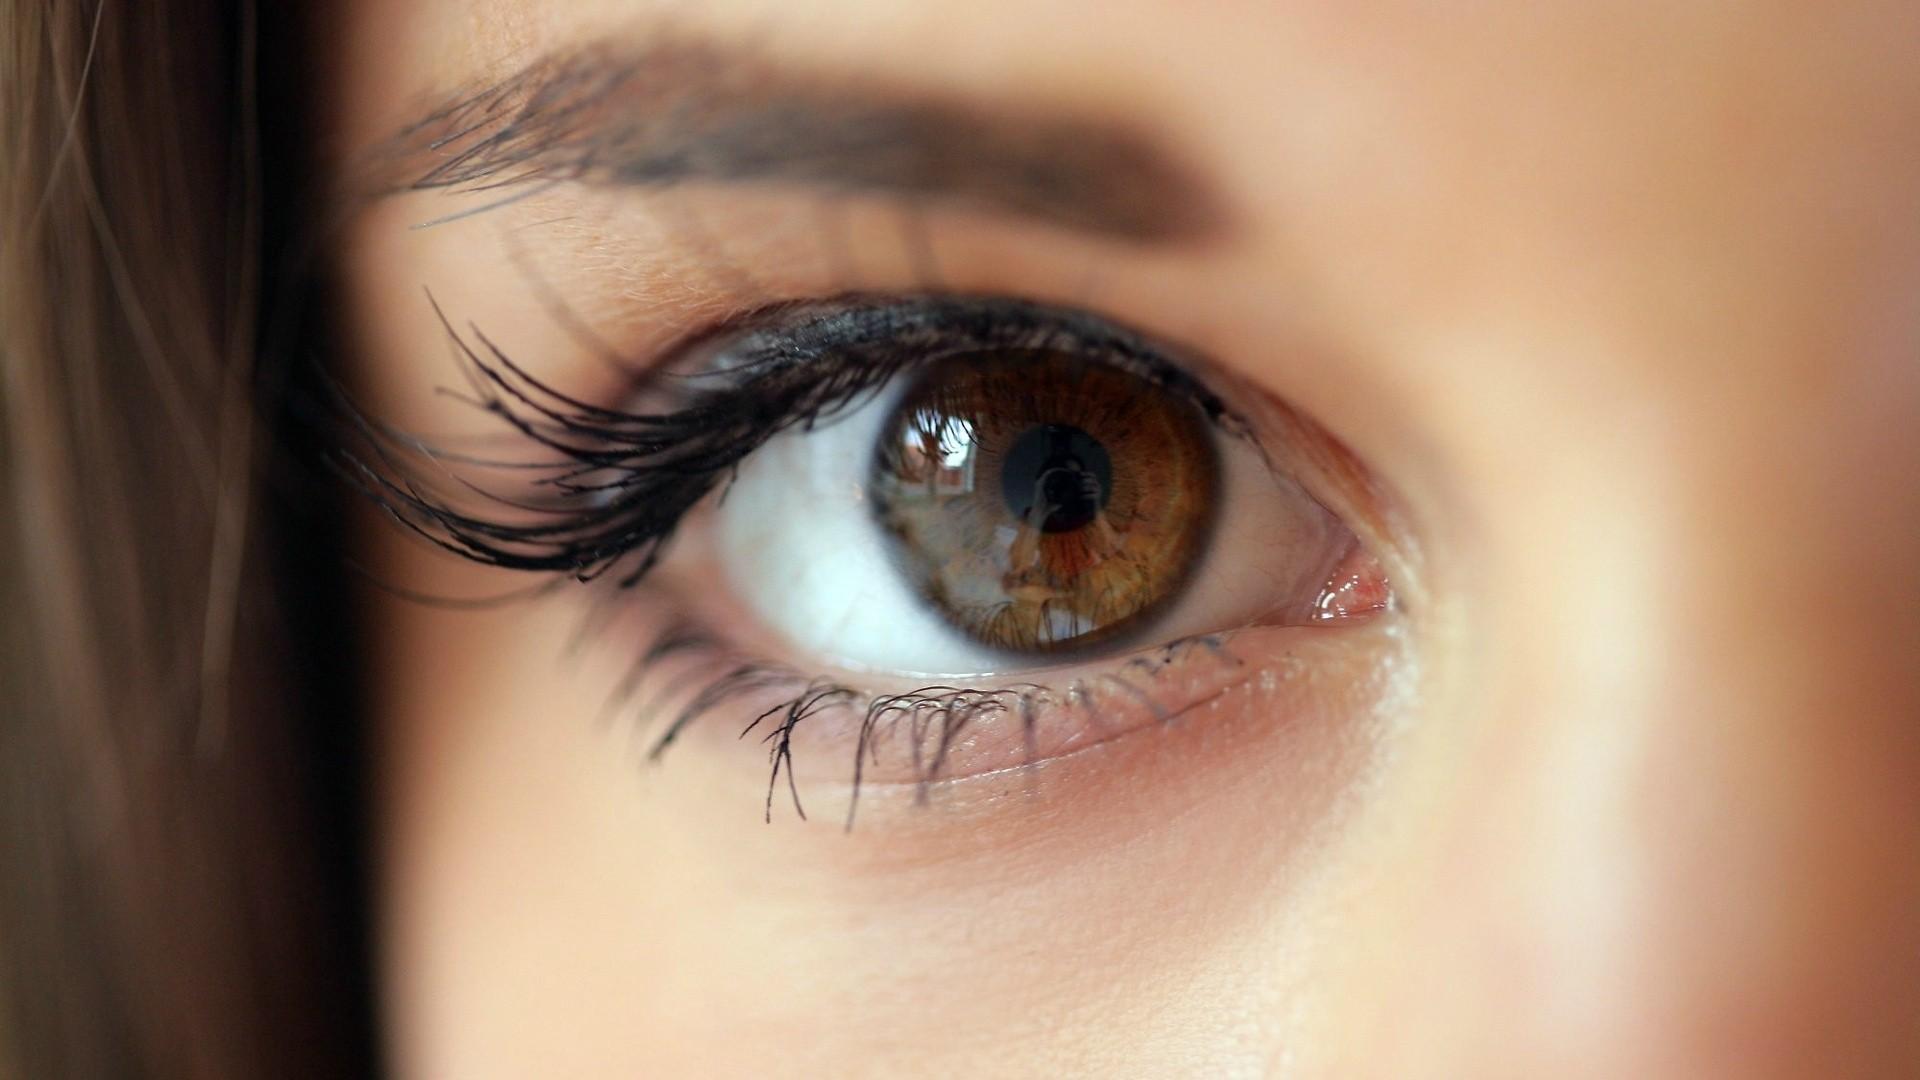 Картинка глаза синие и карие глаза